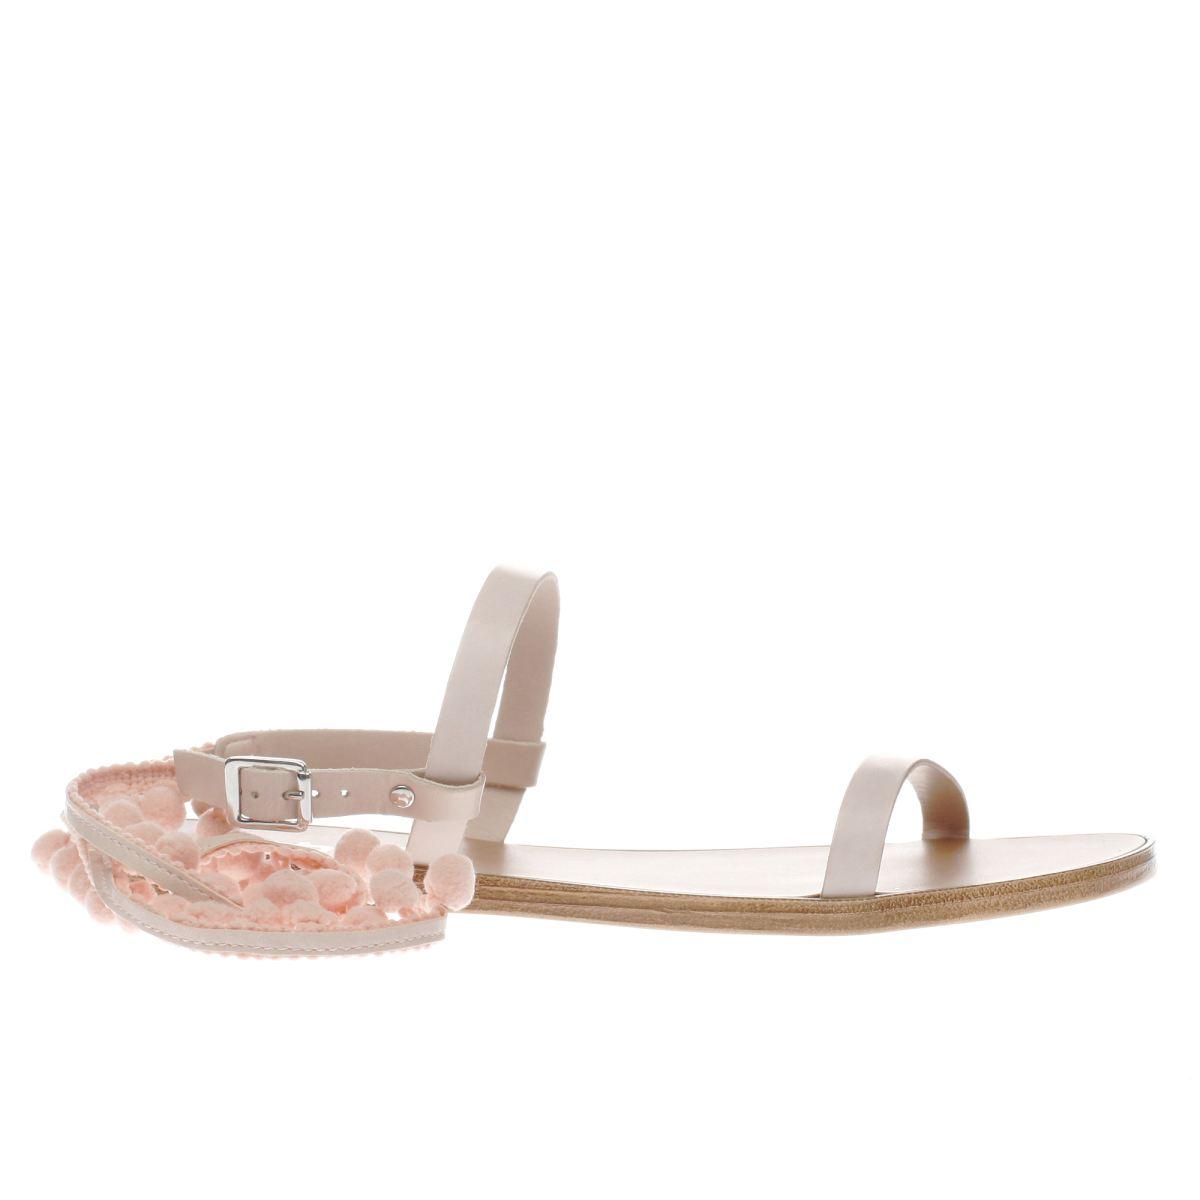 schuh pale pink st tropez sandals